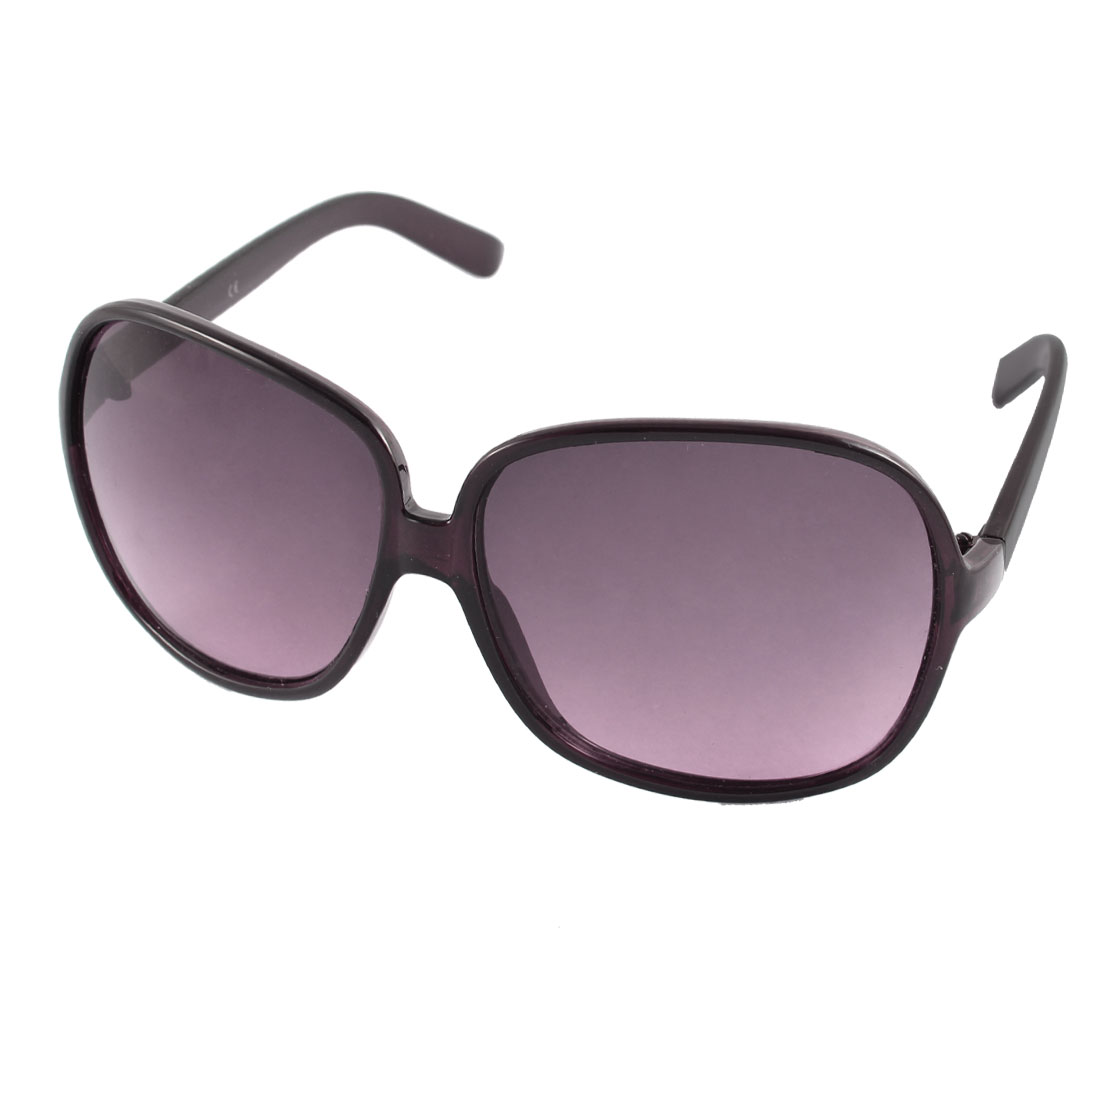 Plastic Oval Burgundy Lens Full Frame Single Bridge Sun Protective Sunglasses